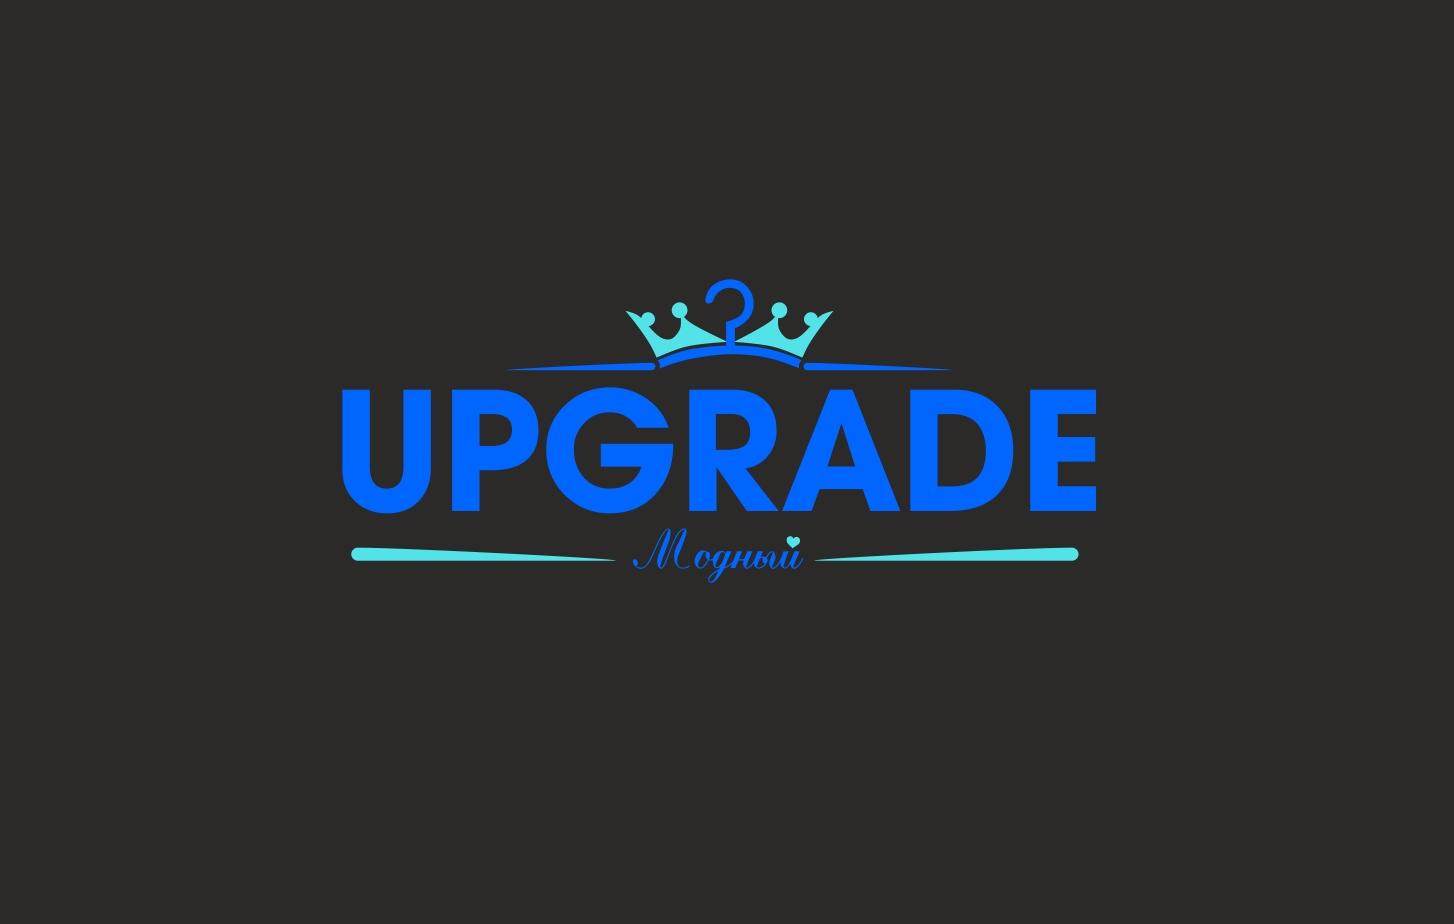 "Логотип интернет магазина ""Модный UPGRADE"" фото f_04159483ed026752.jpg"